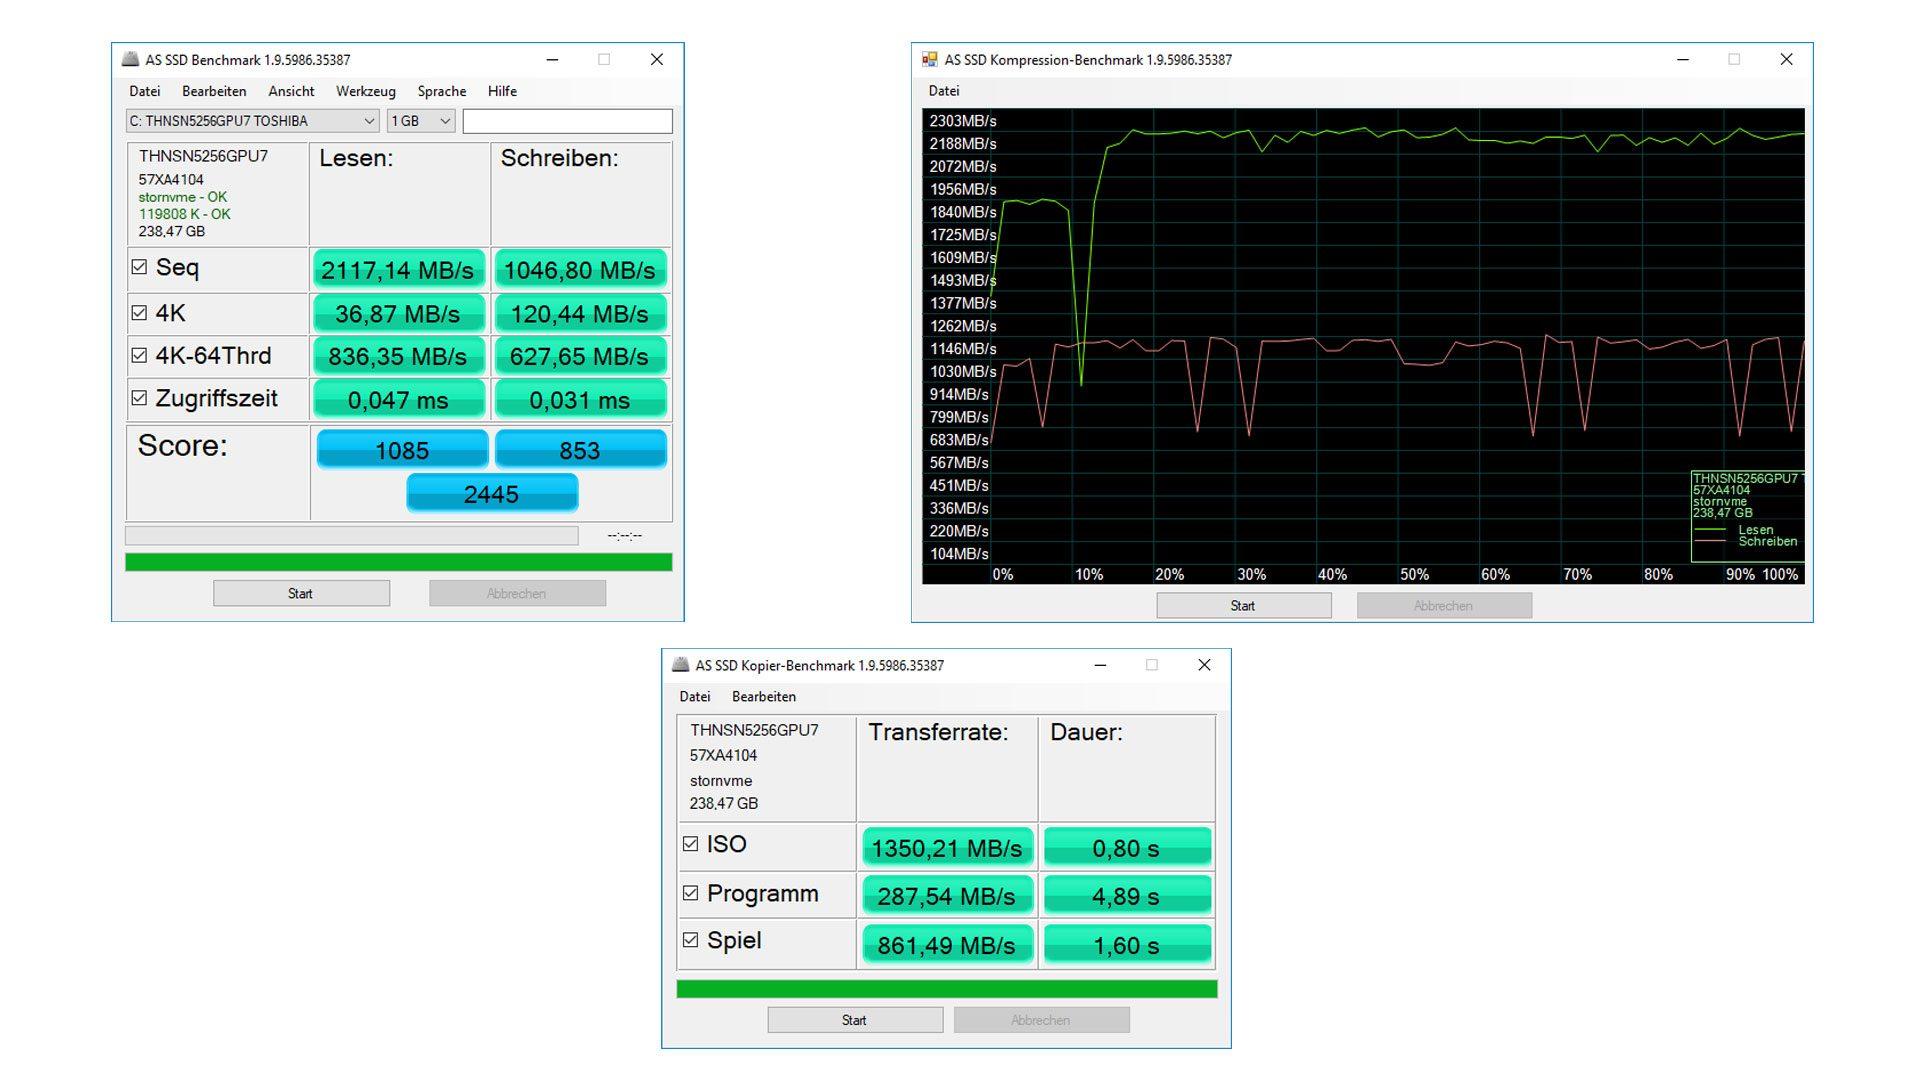 Acer-Predator-17-G9-793-718-Benchmark-5